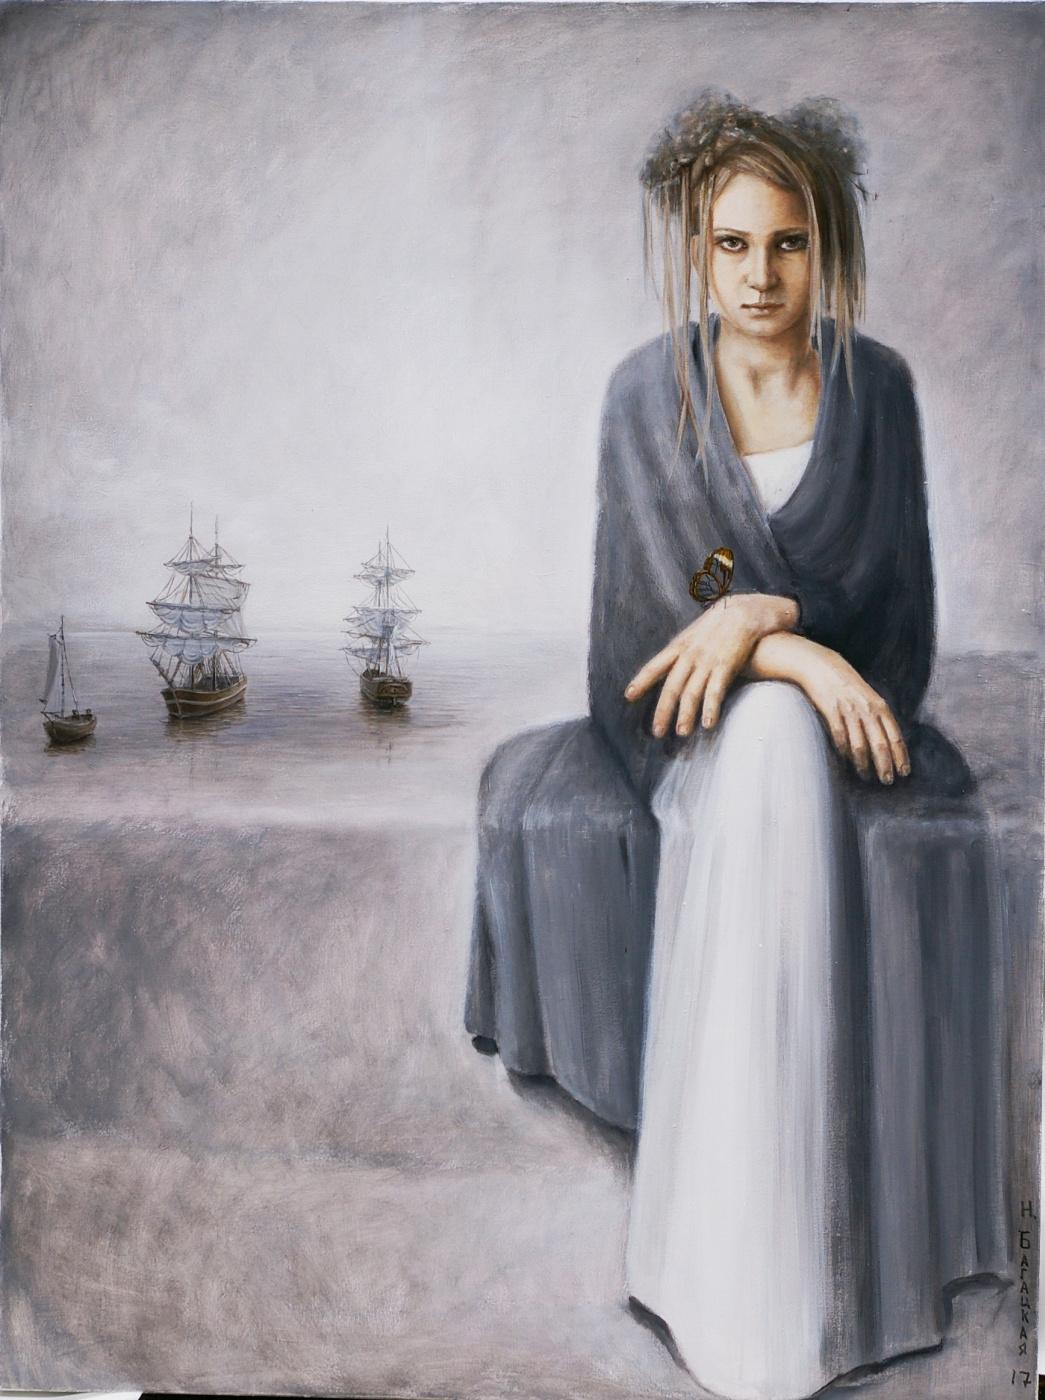 Natalia Bagatskaya. Assol